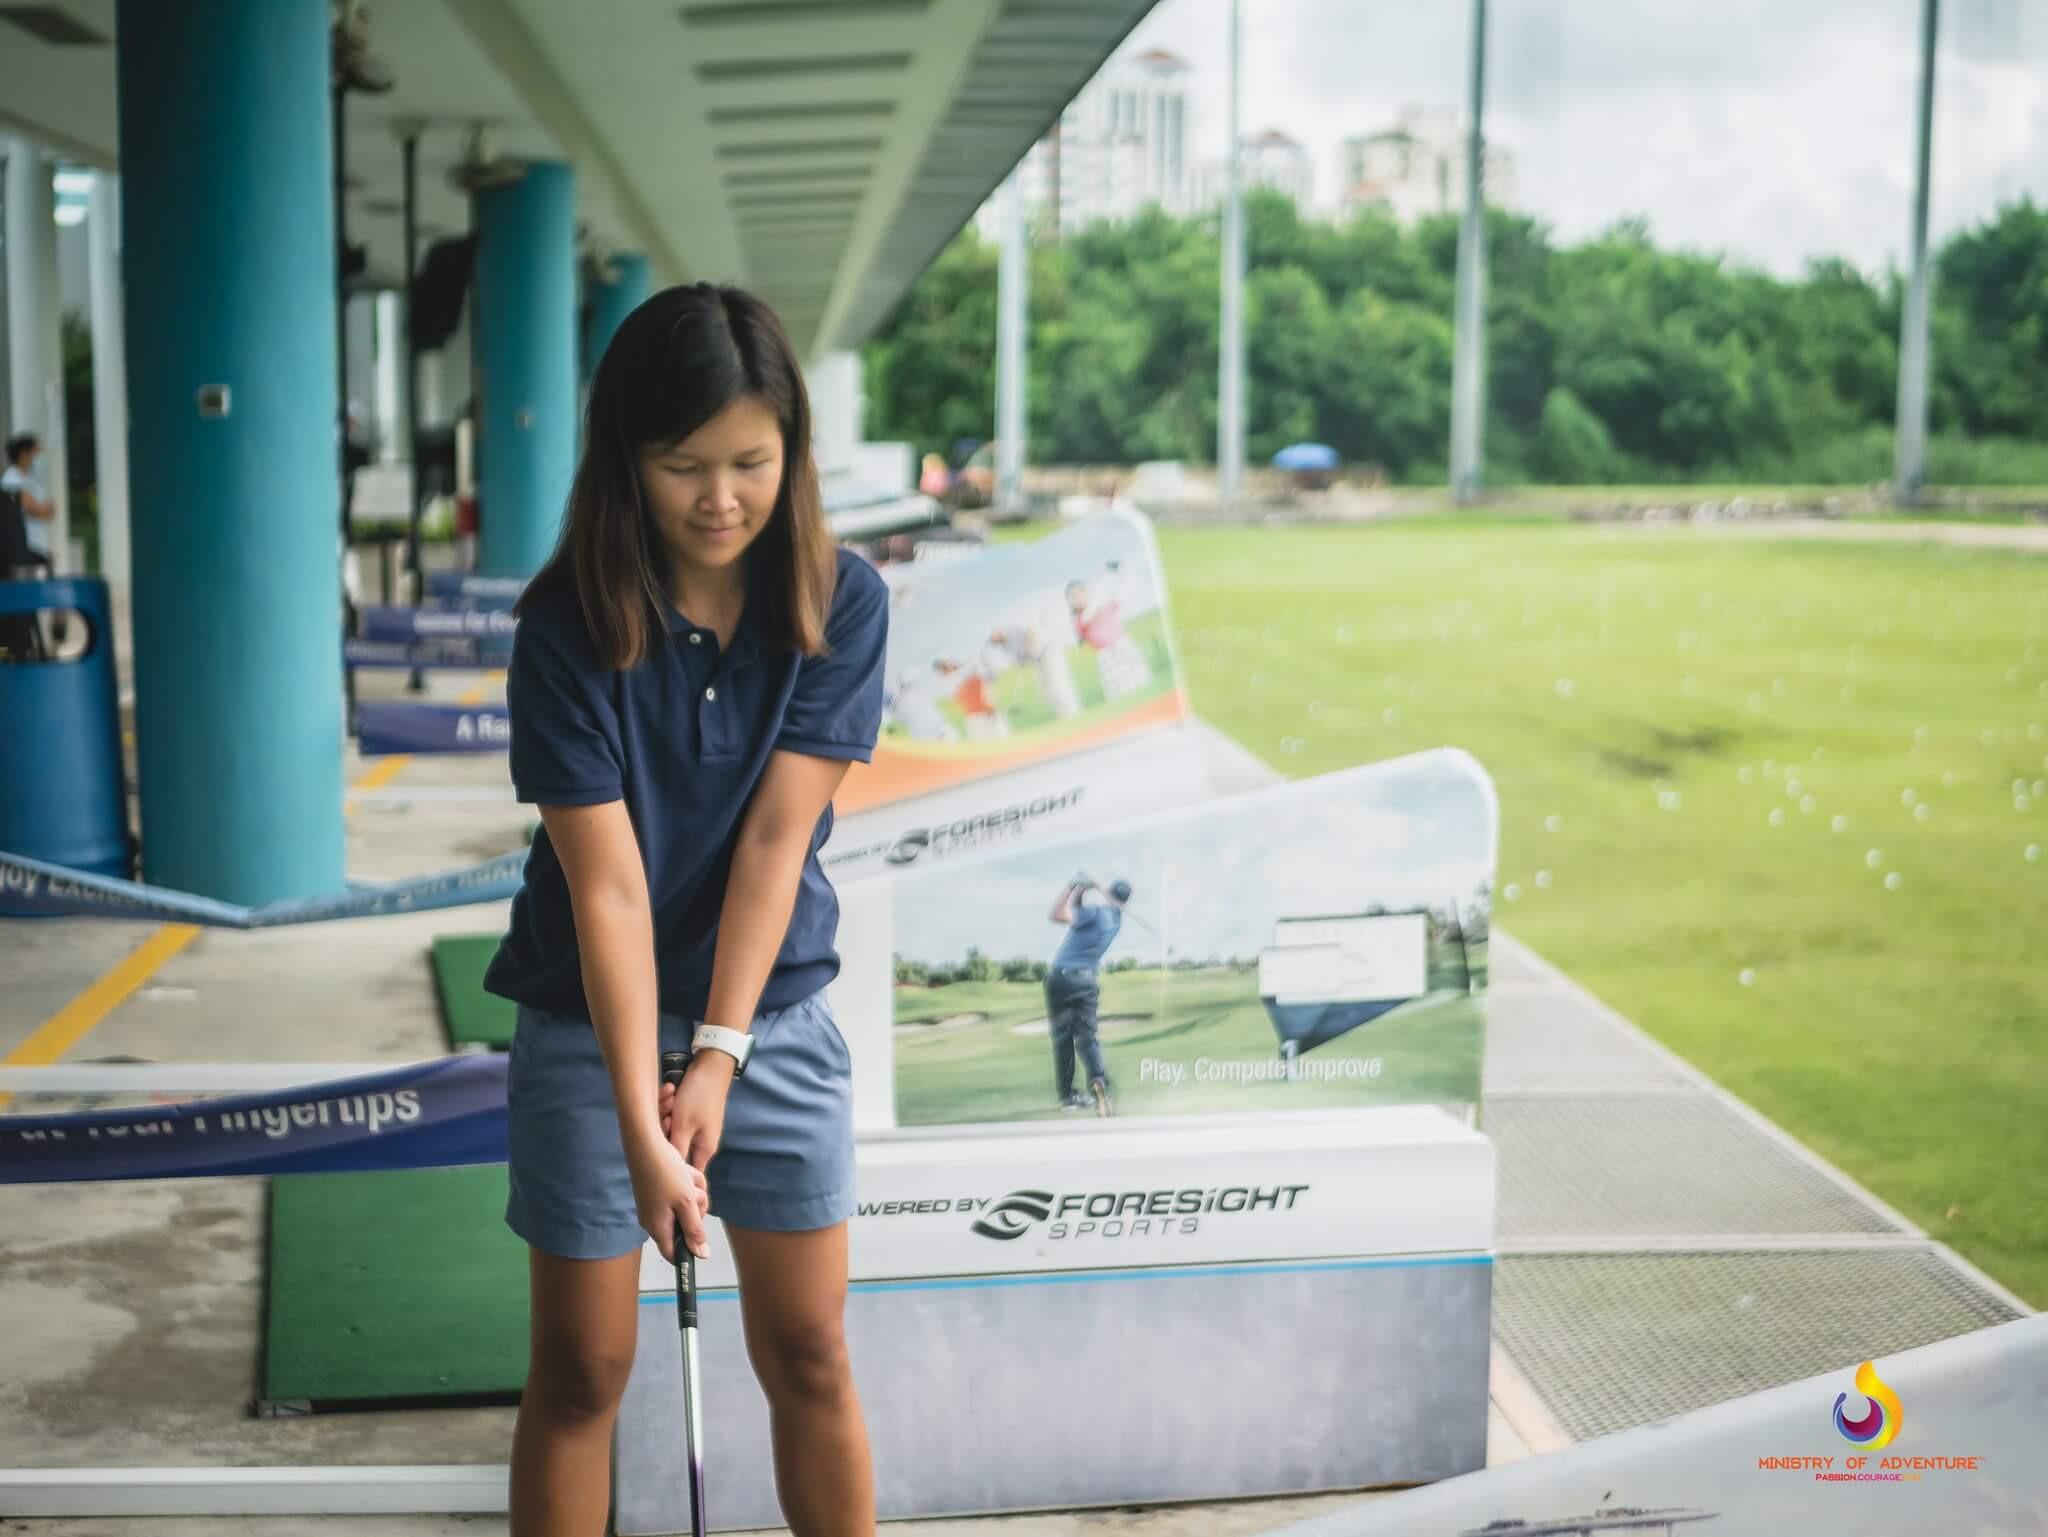 Copy of Let's Play Golf! (Members) 5 pax